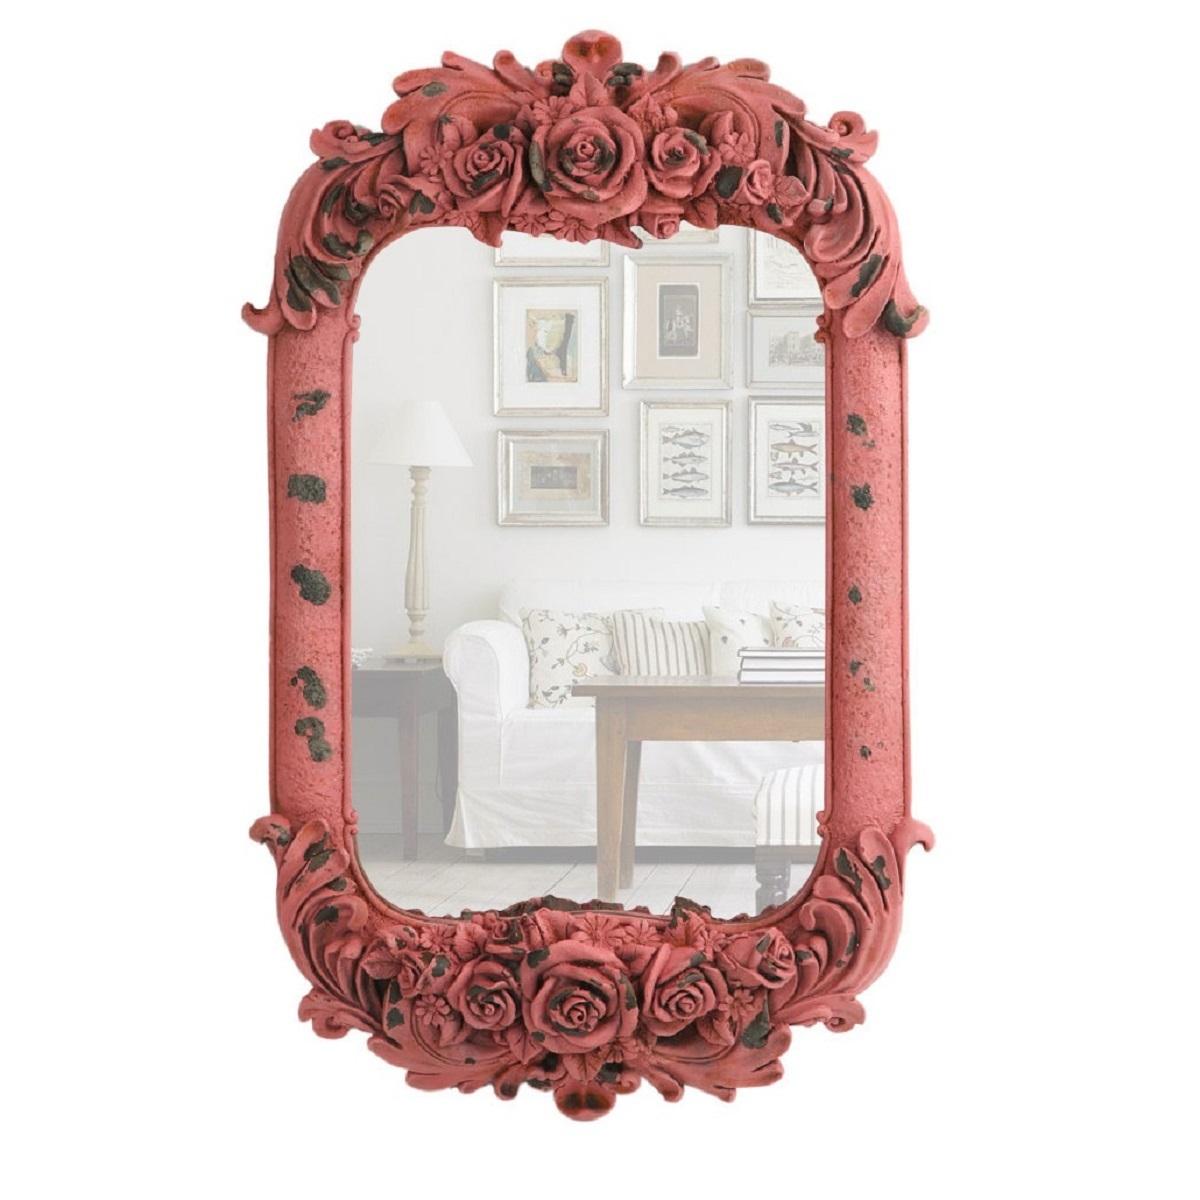 Зеркала Зеркало настенное Decor розовое 85103AP zerkalo-nastennoe-decor-rozovoe-85103ap-kitay.jpg